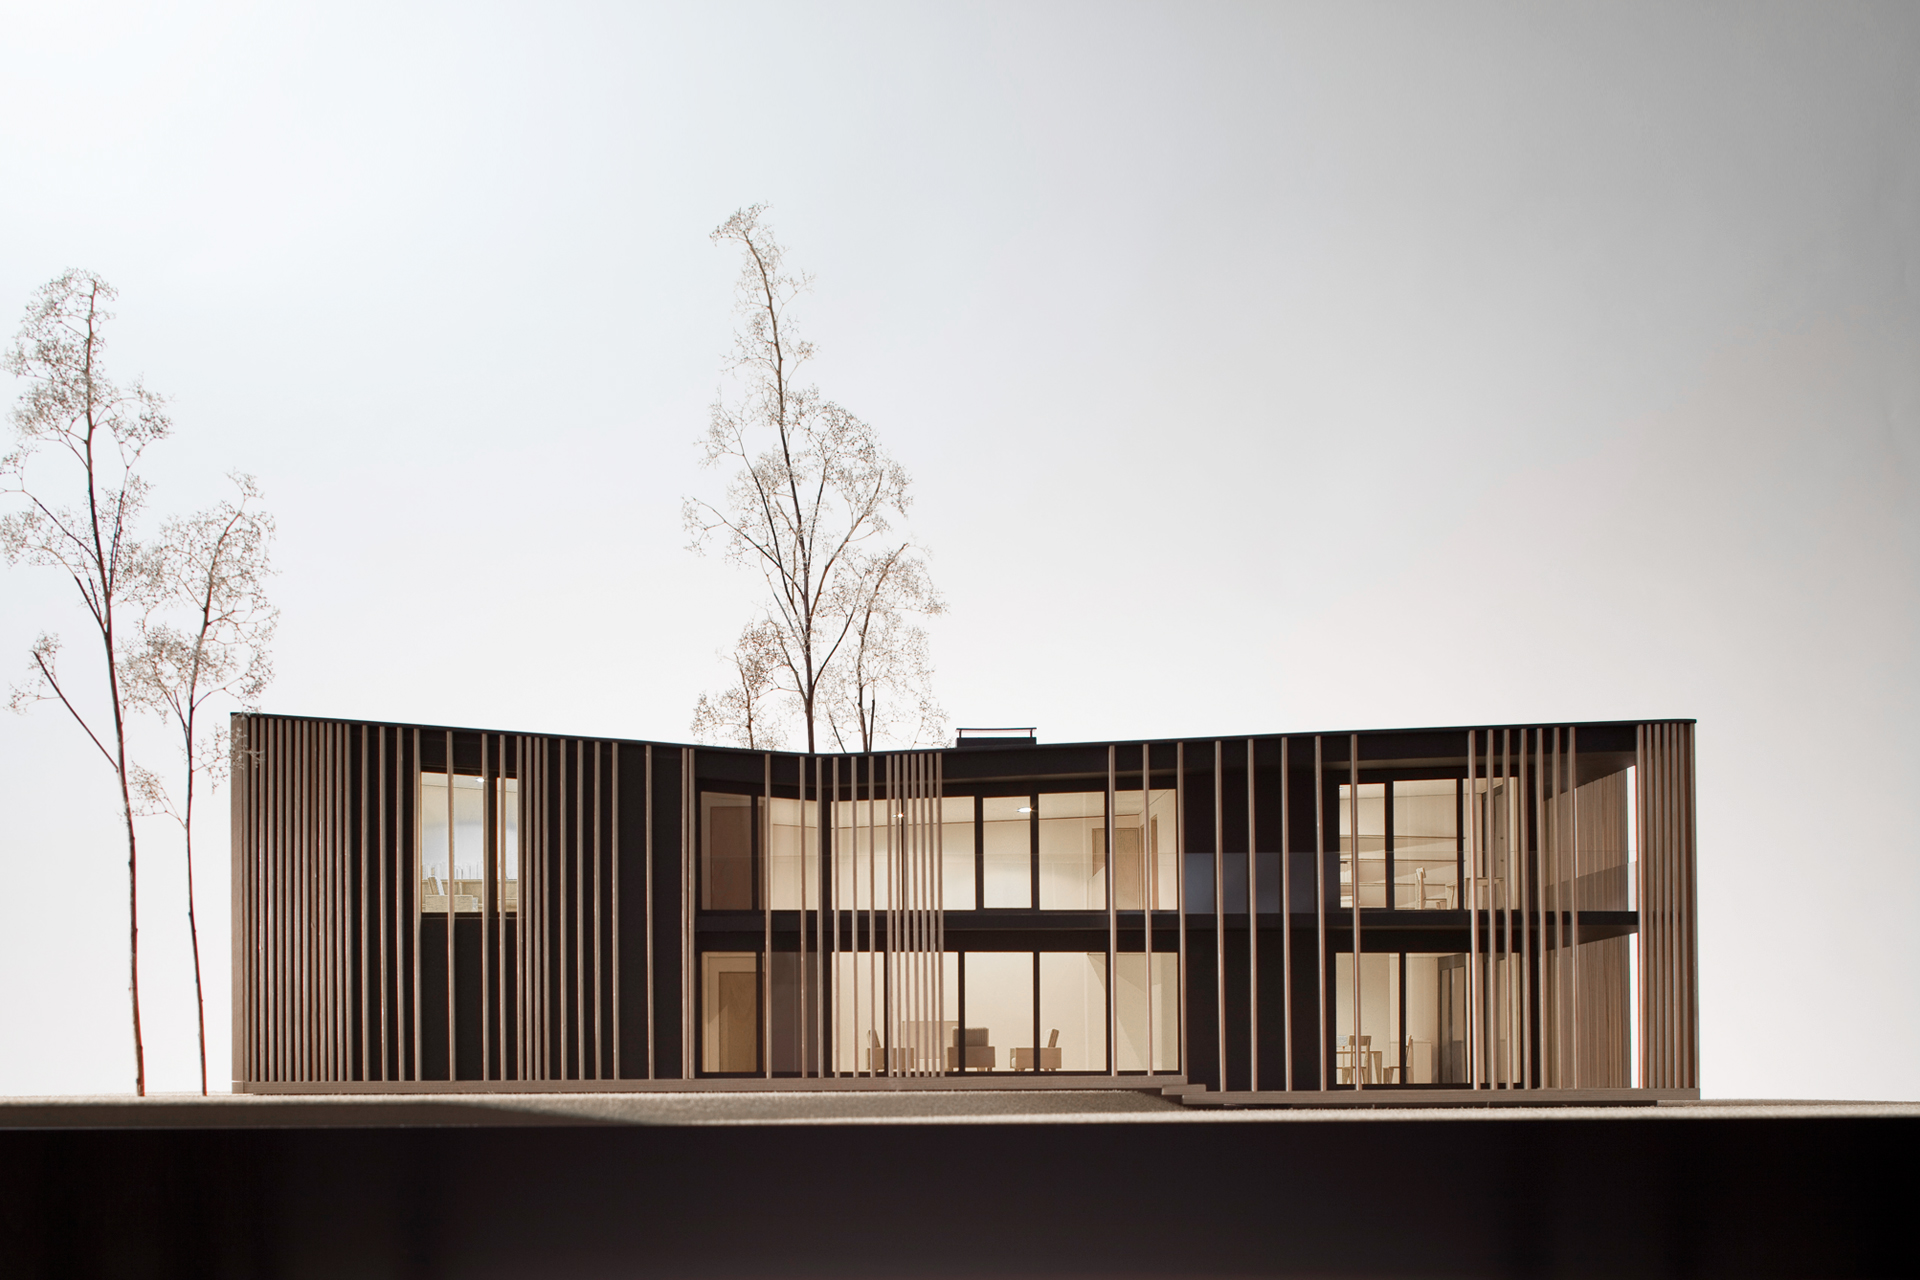 onimo-makiety-architektoniczne-PAG-shutter-02